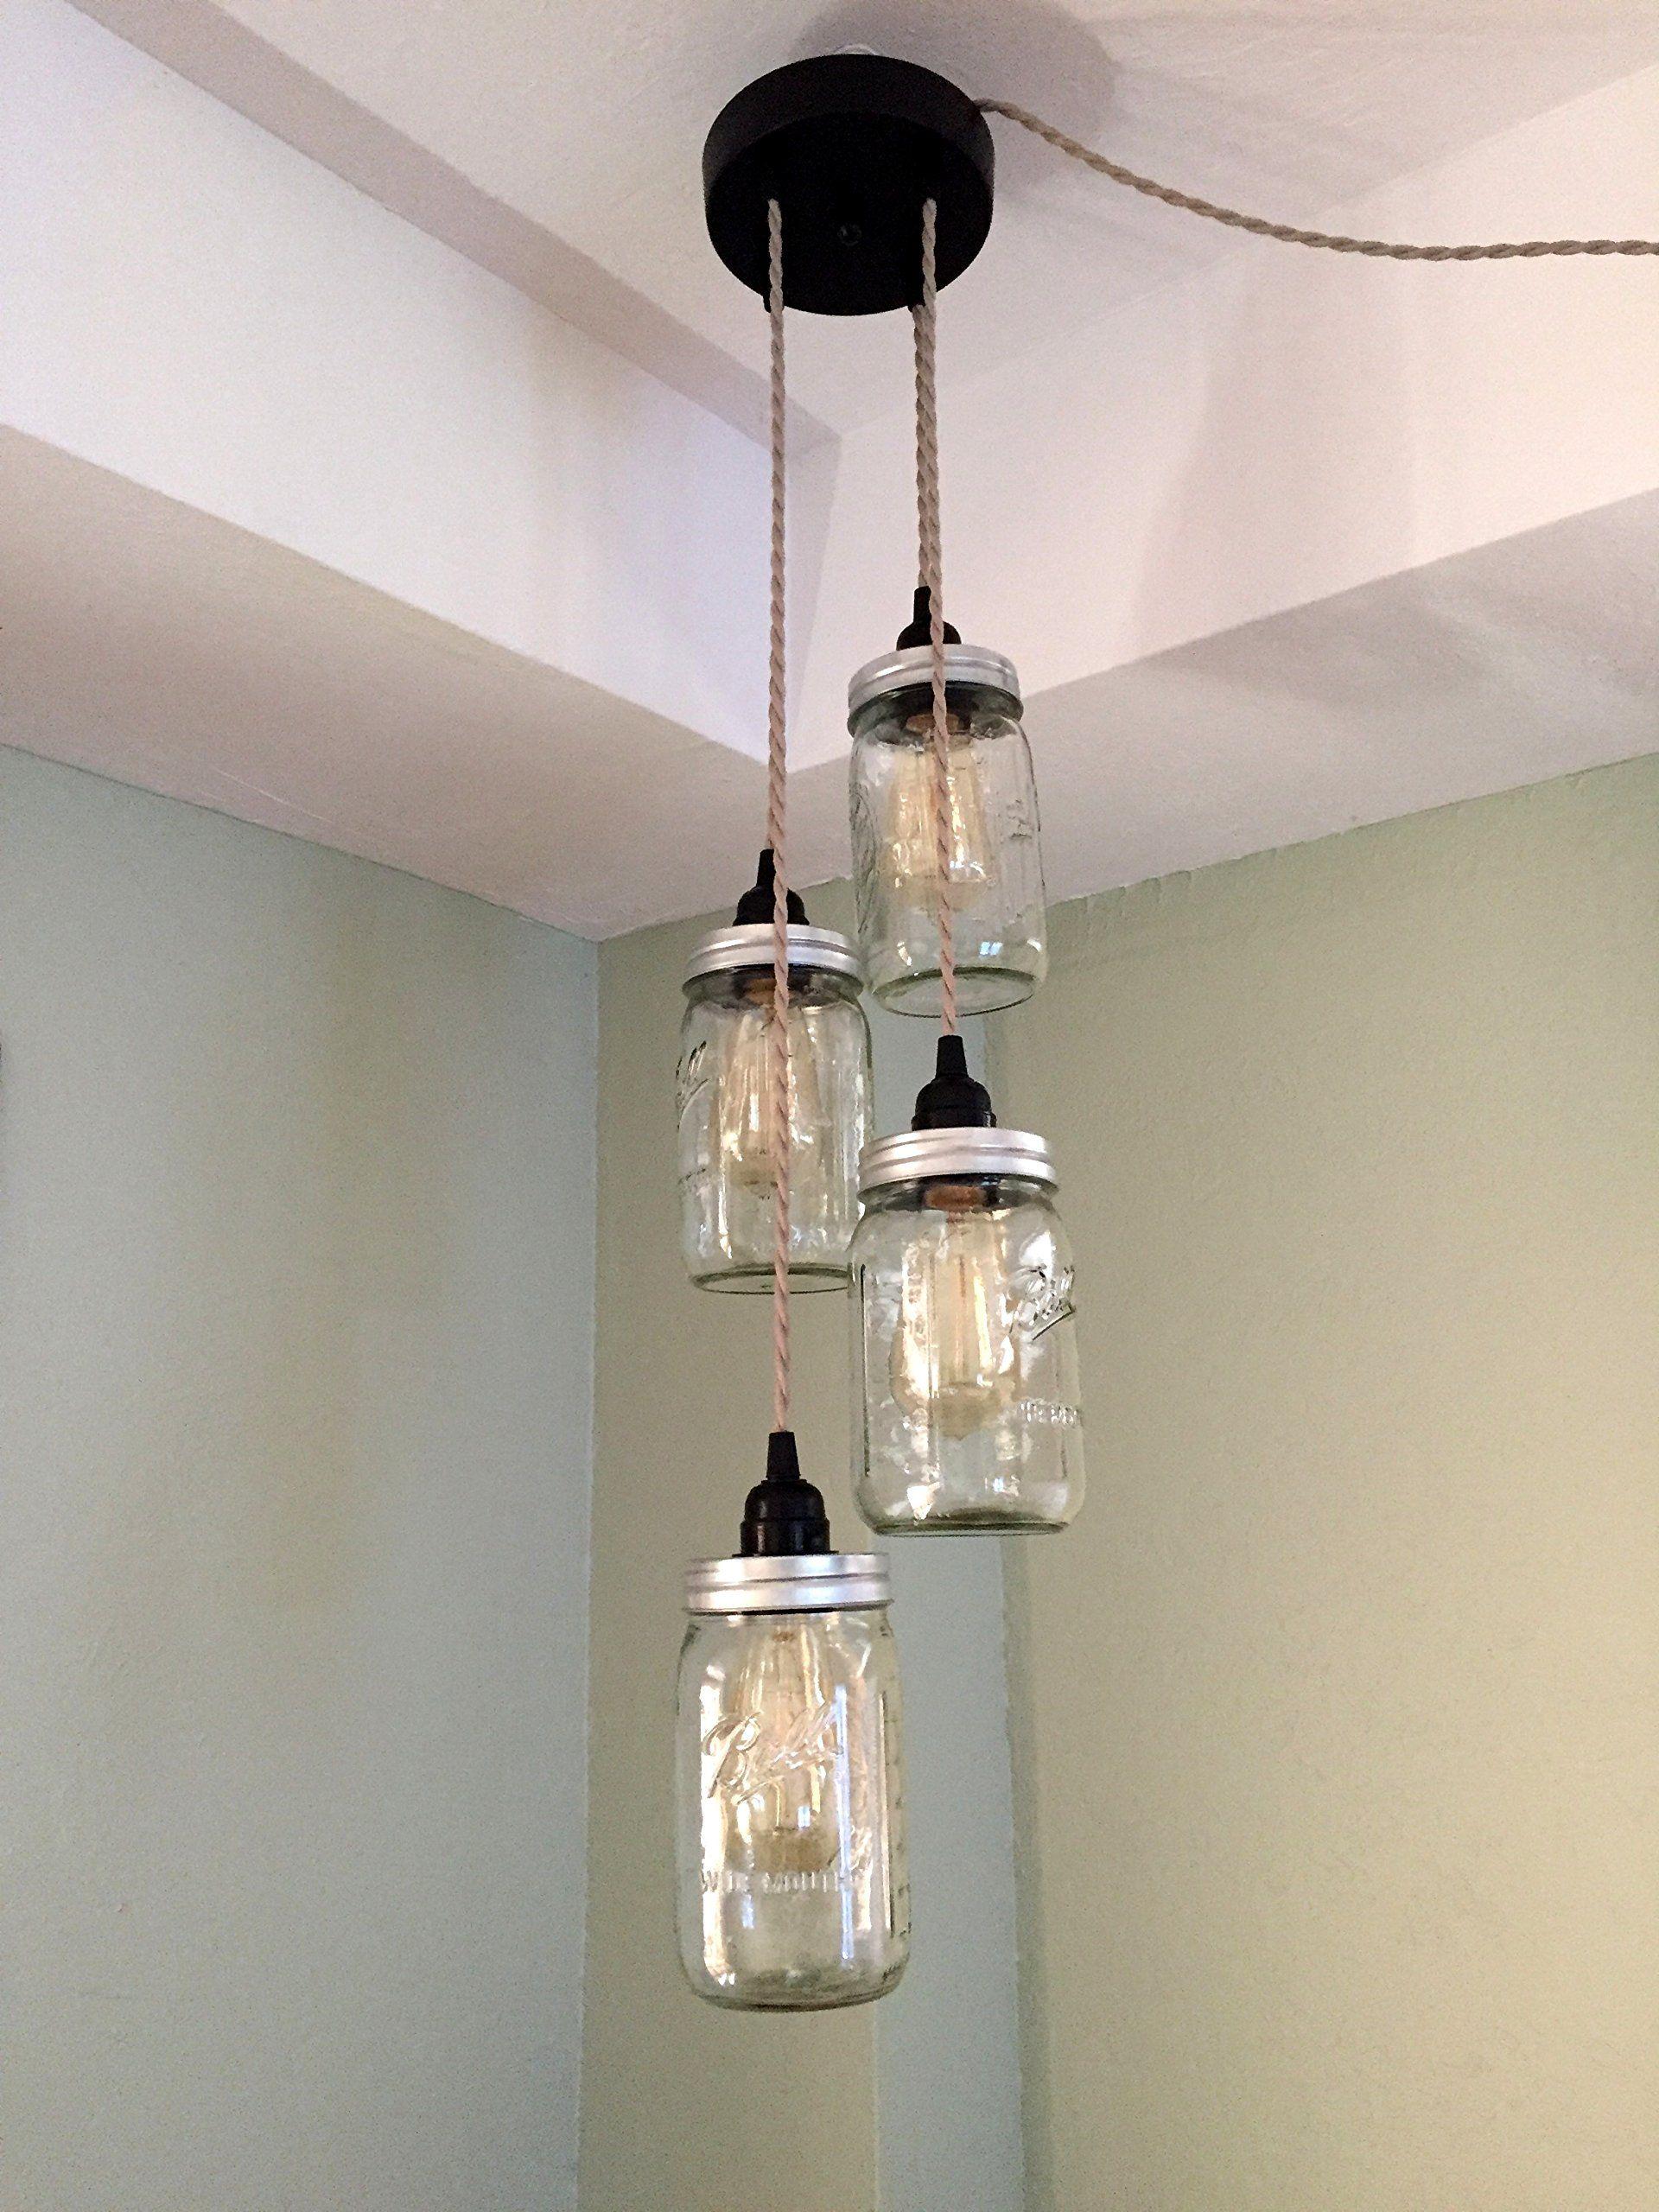 Mason jar chandelier swag light no hard wiring just hang it up